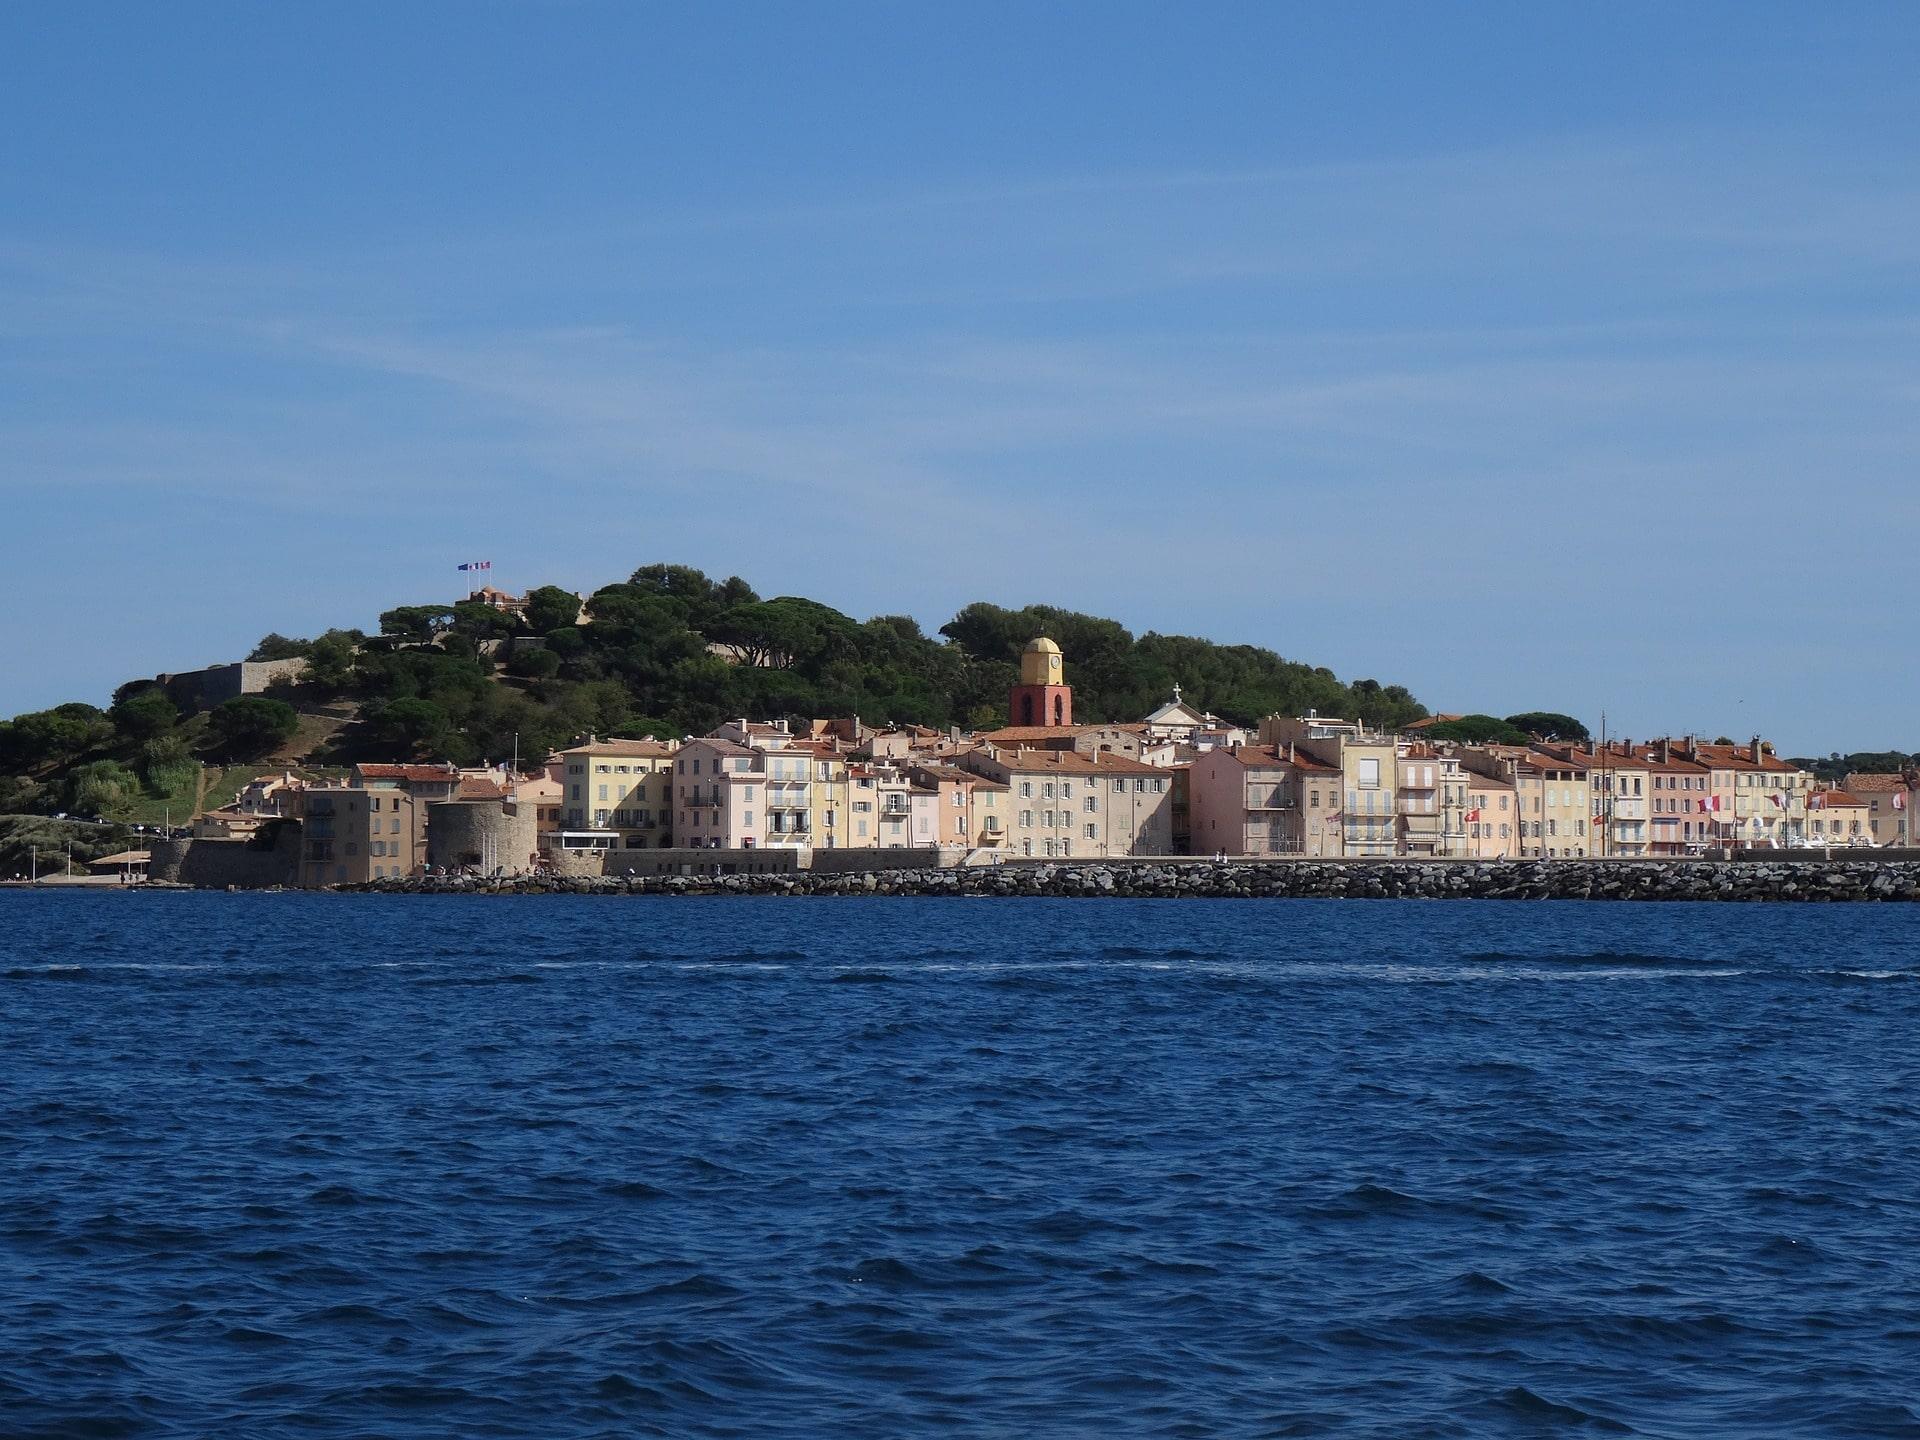 Saint-Tropez vu de la mer Méditerranée - CC0 Emma Blowers